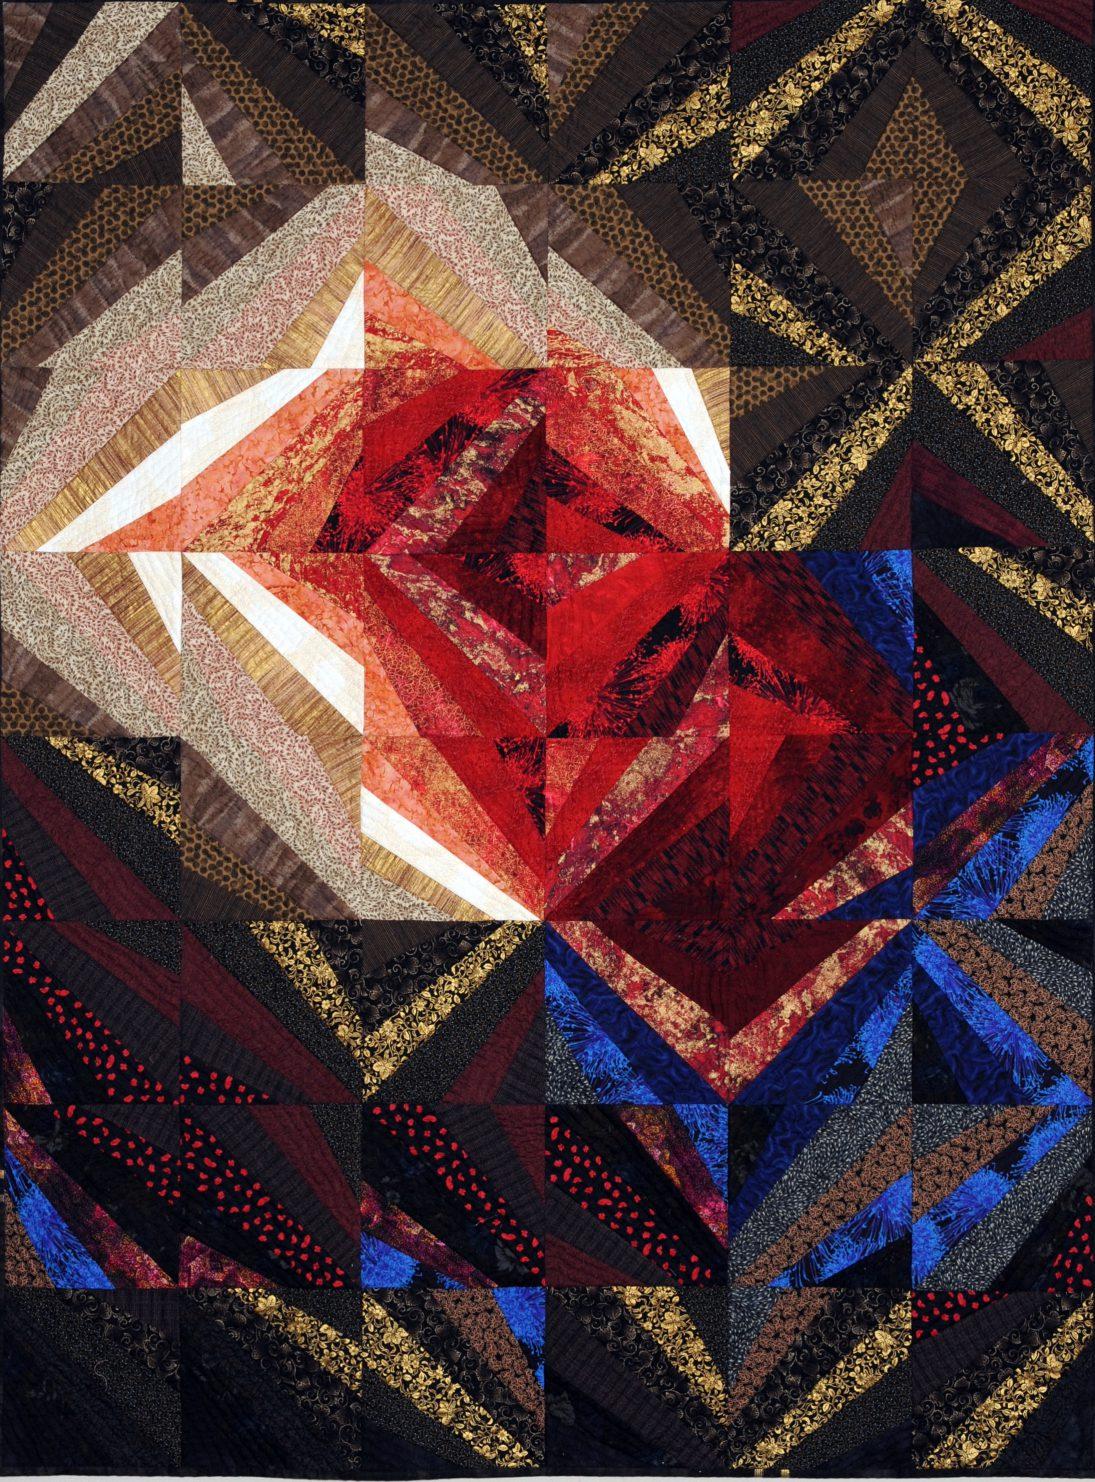 第70回滋賀県美術展覧会(工芸の部)特選「聖火・時を超えて PART-Ⅱ」